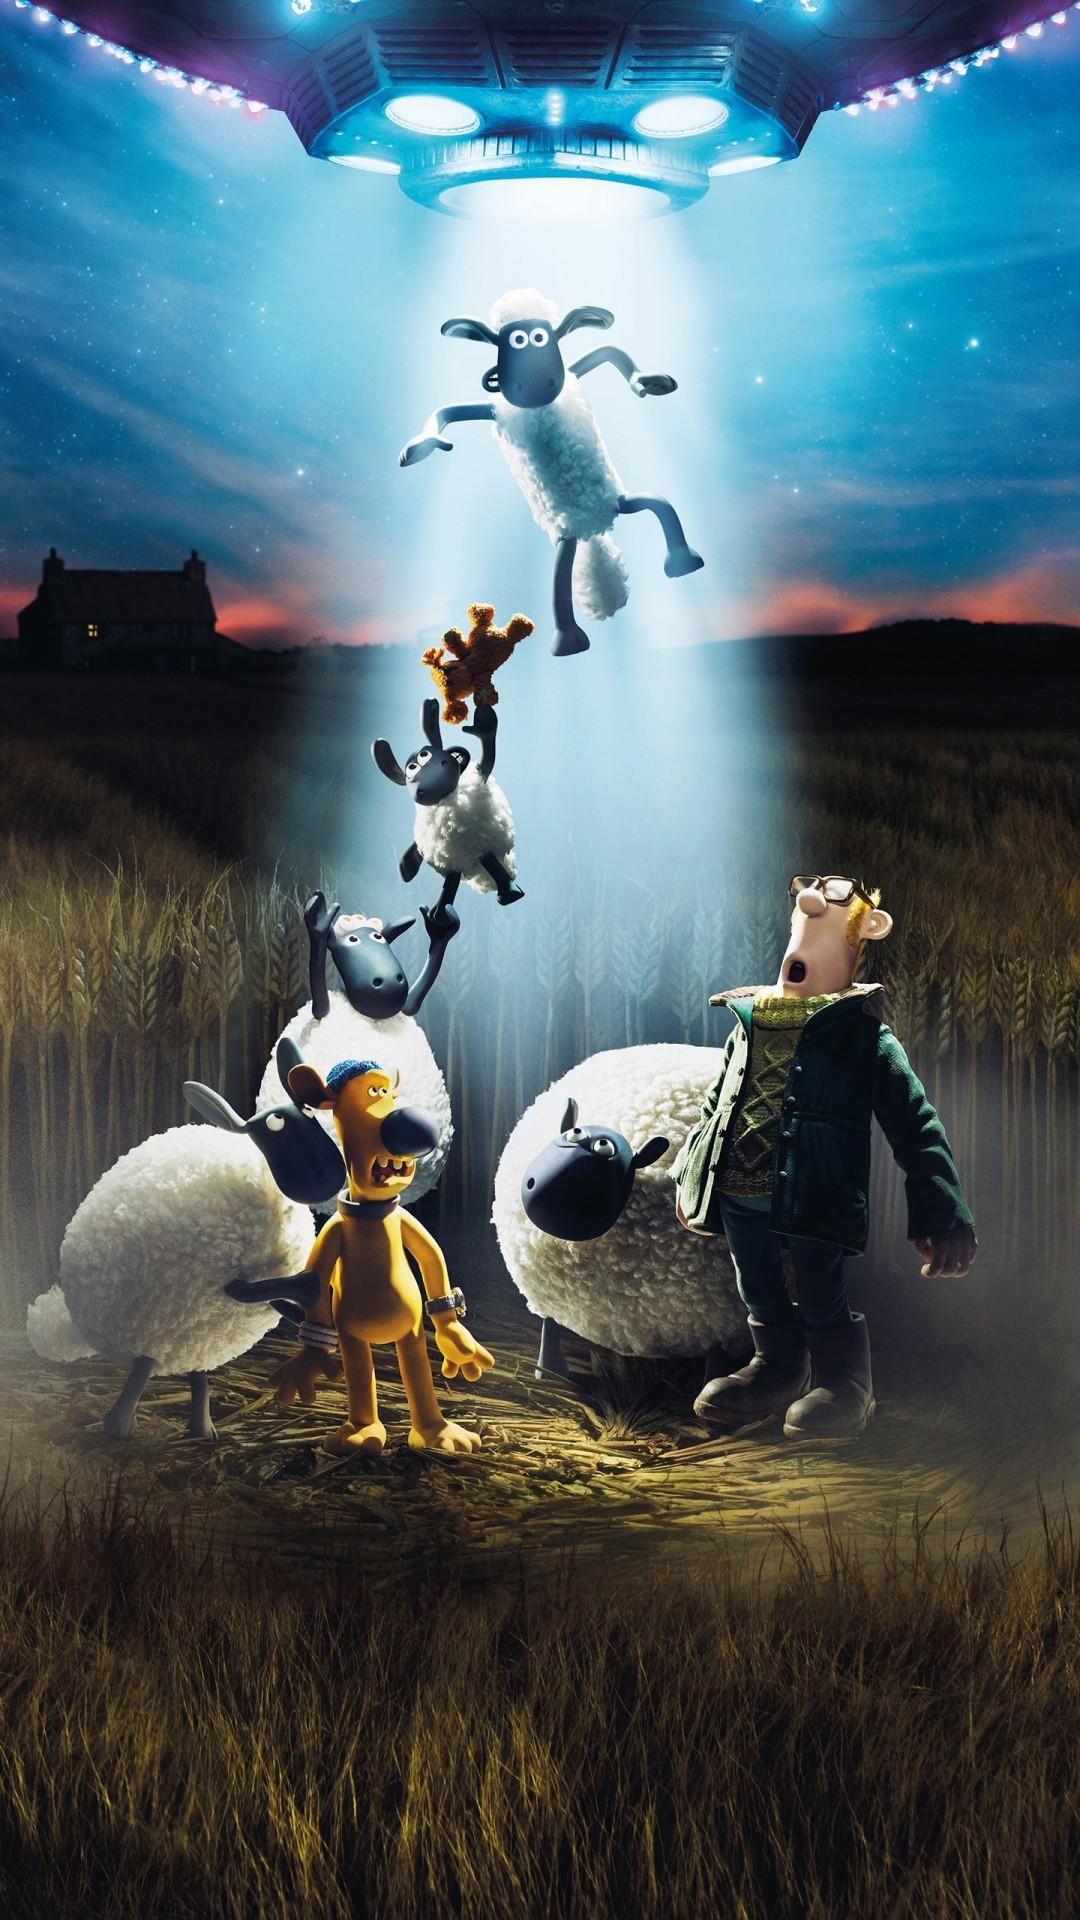 Free Shaun the Sheep Movie Farmageddon phone wallpaper by cvent15